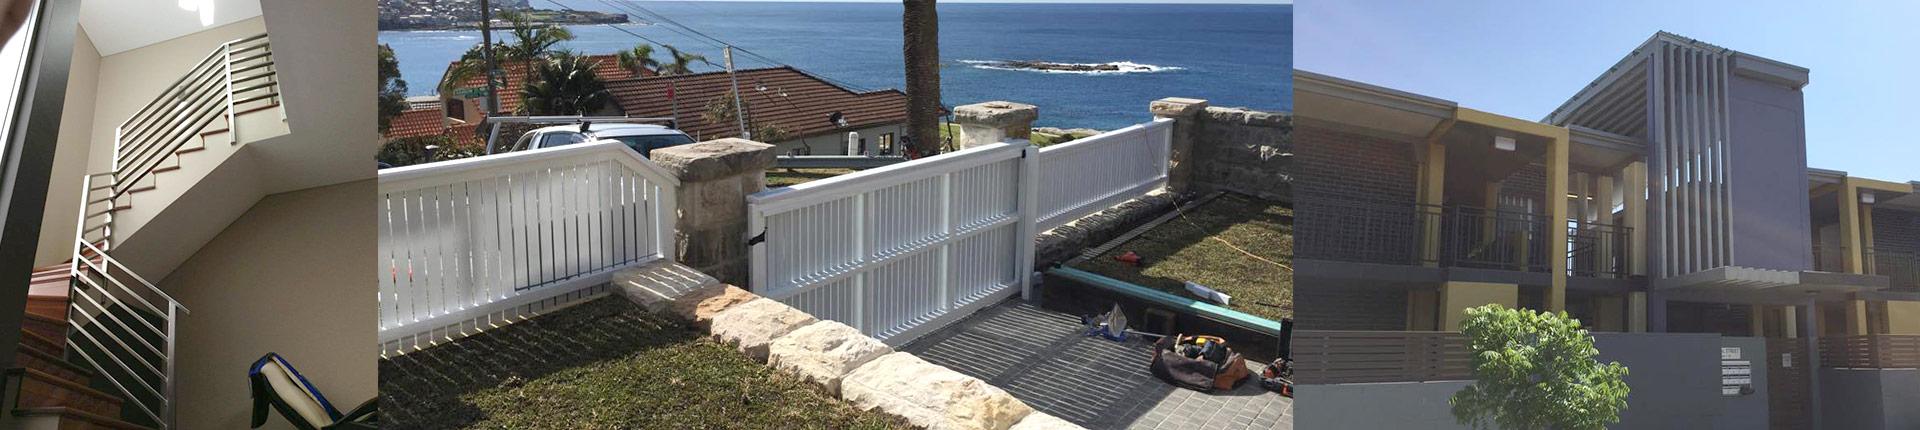 home-slide02